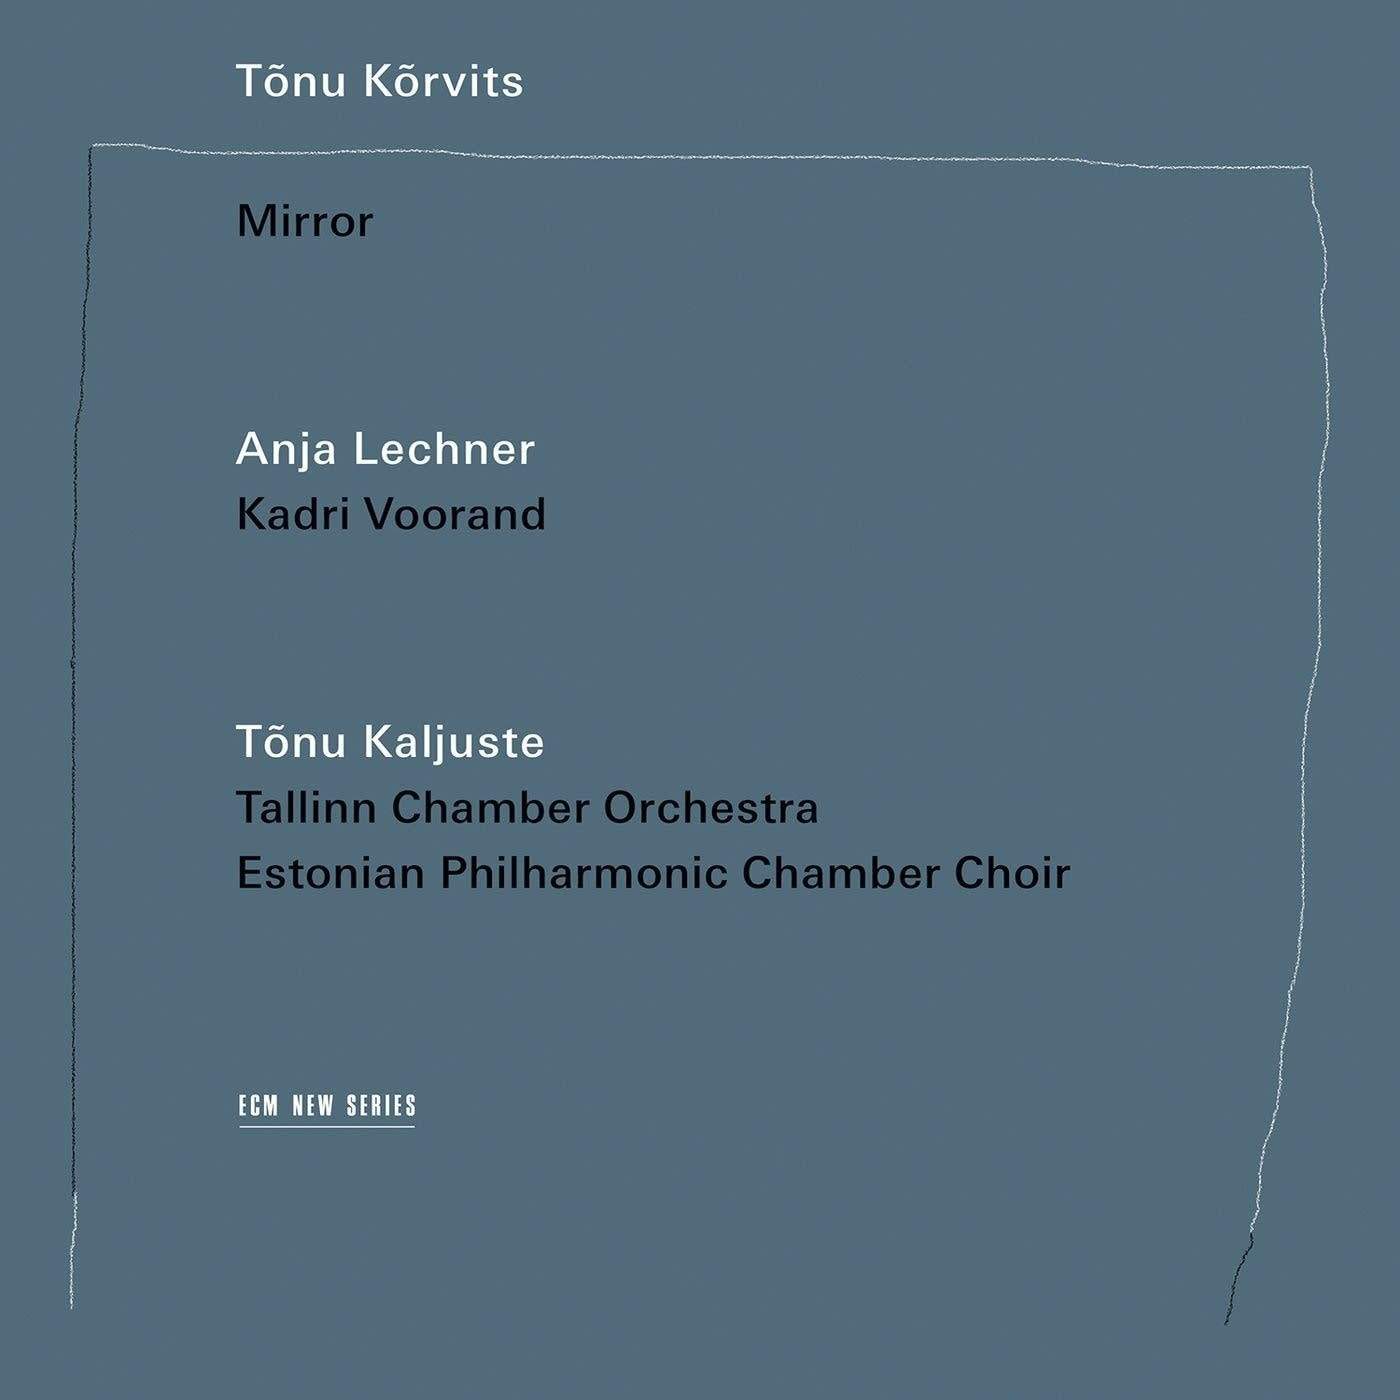 Tonu Korvits, 'Mirror'